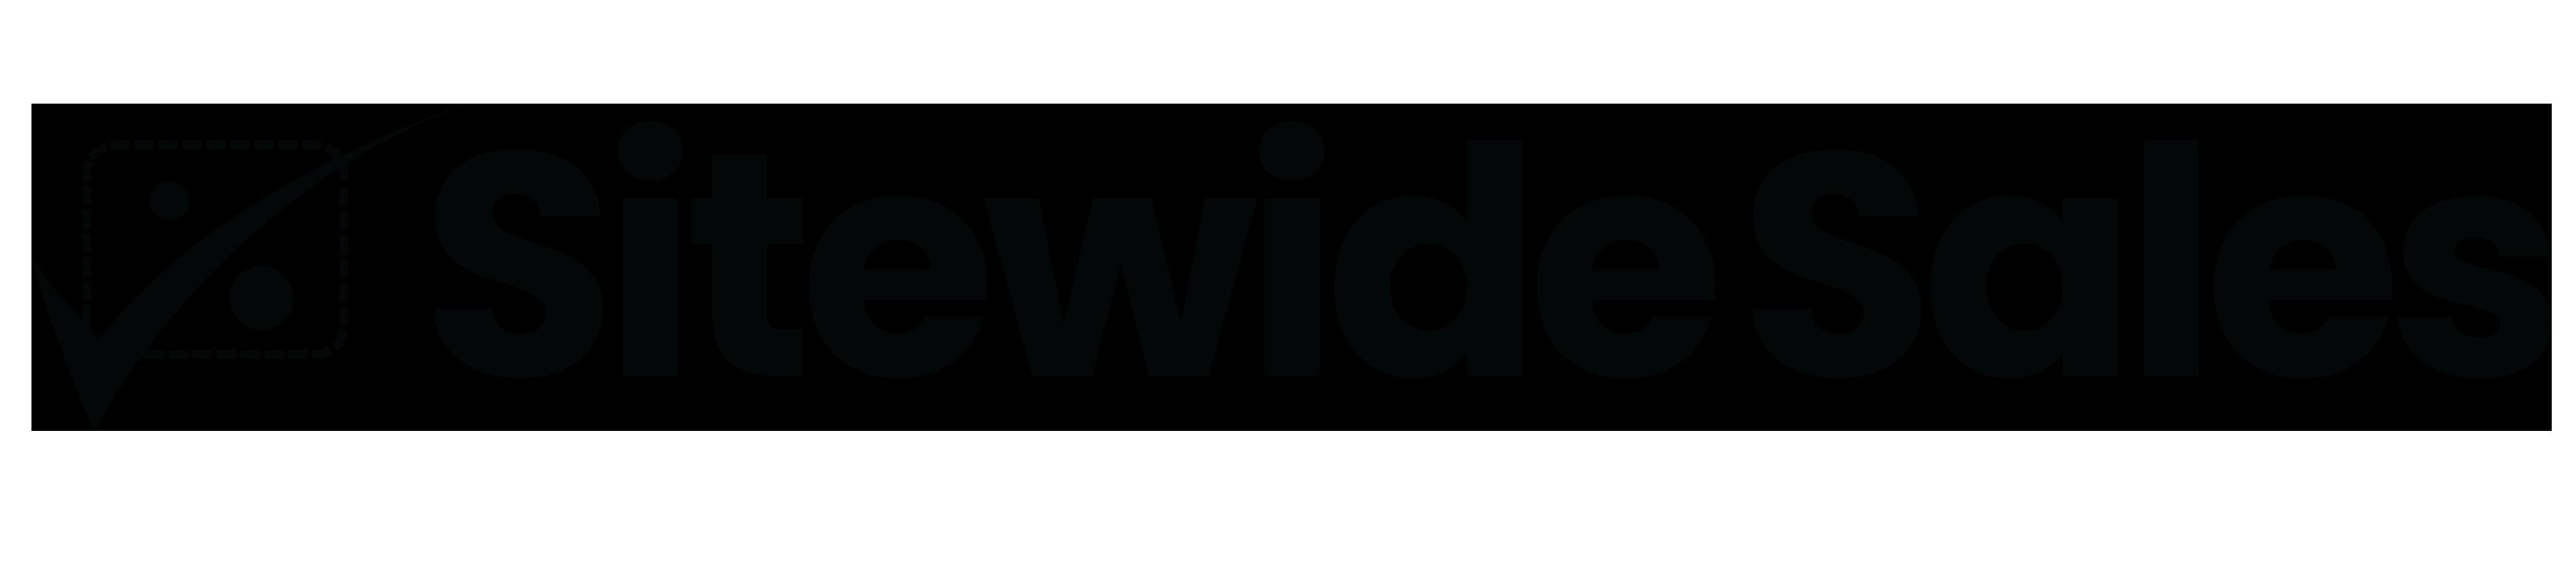 Sitewide Sales Black Logo as PNG